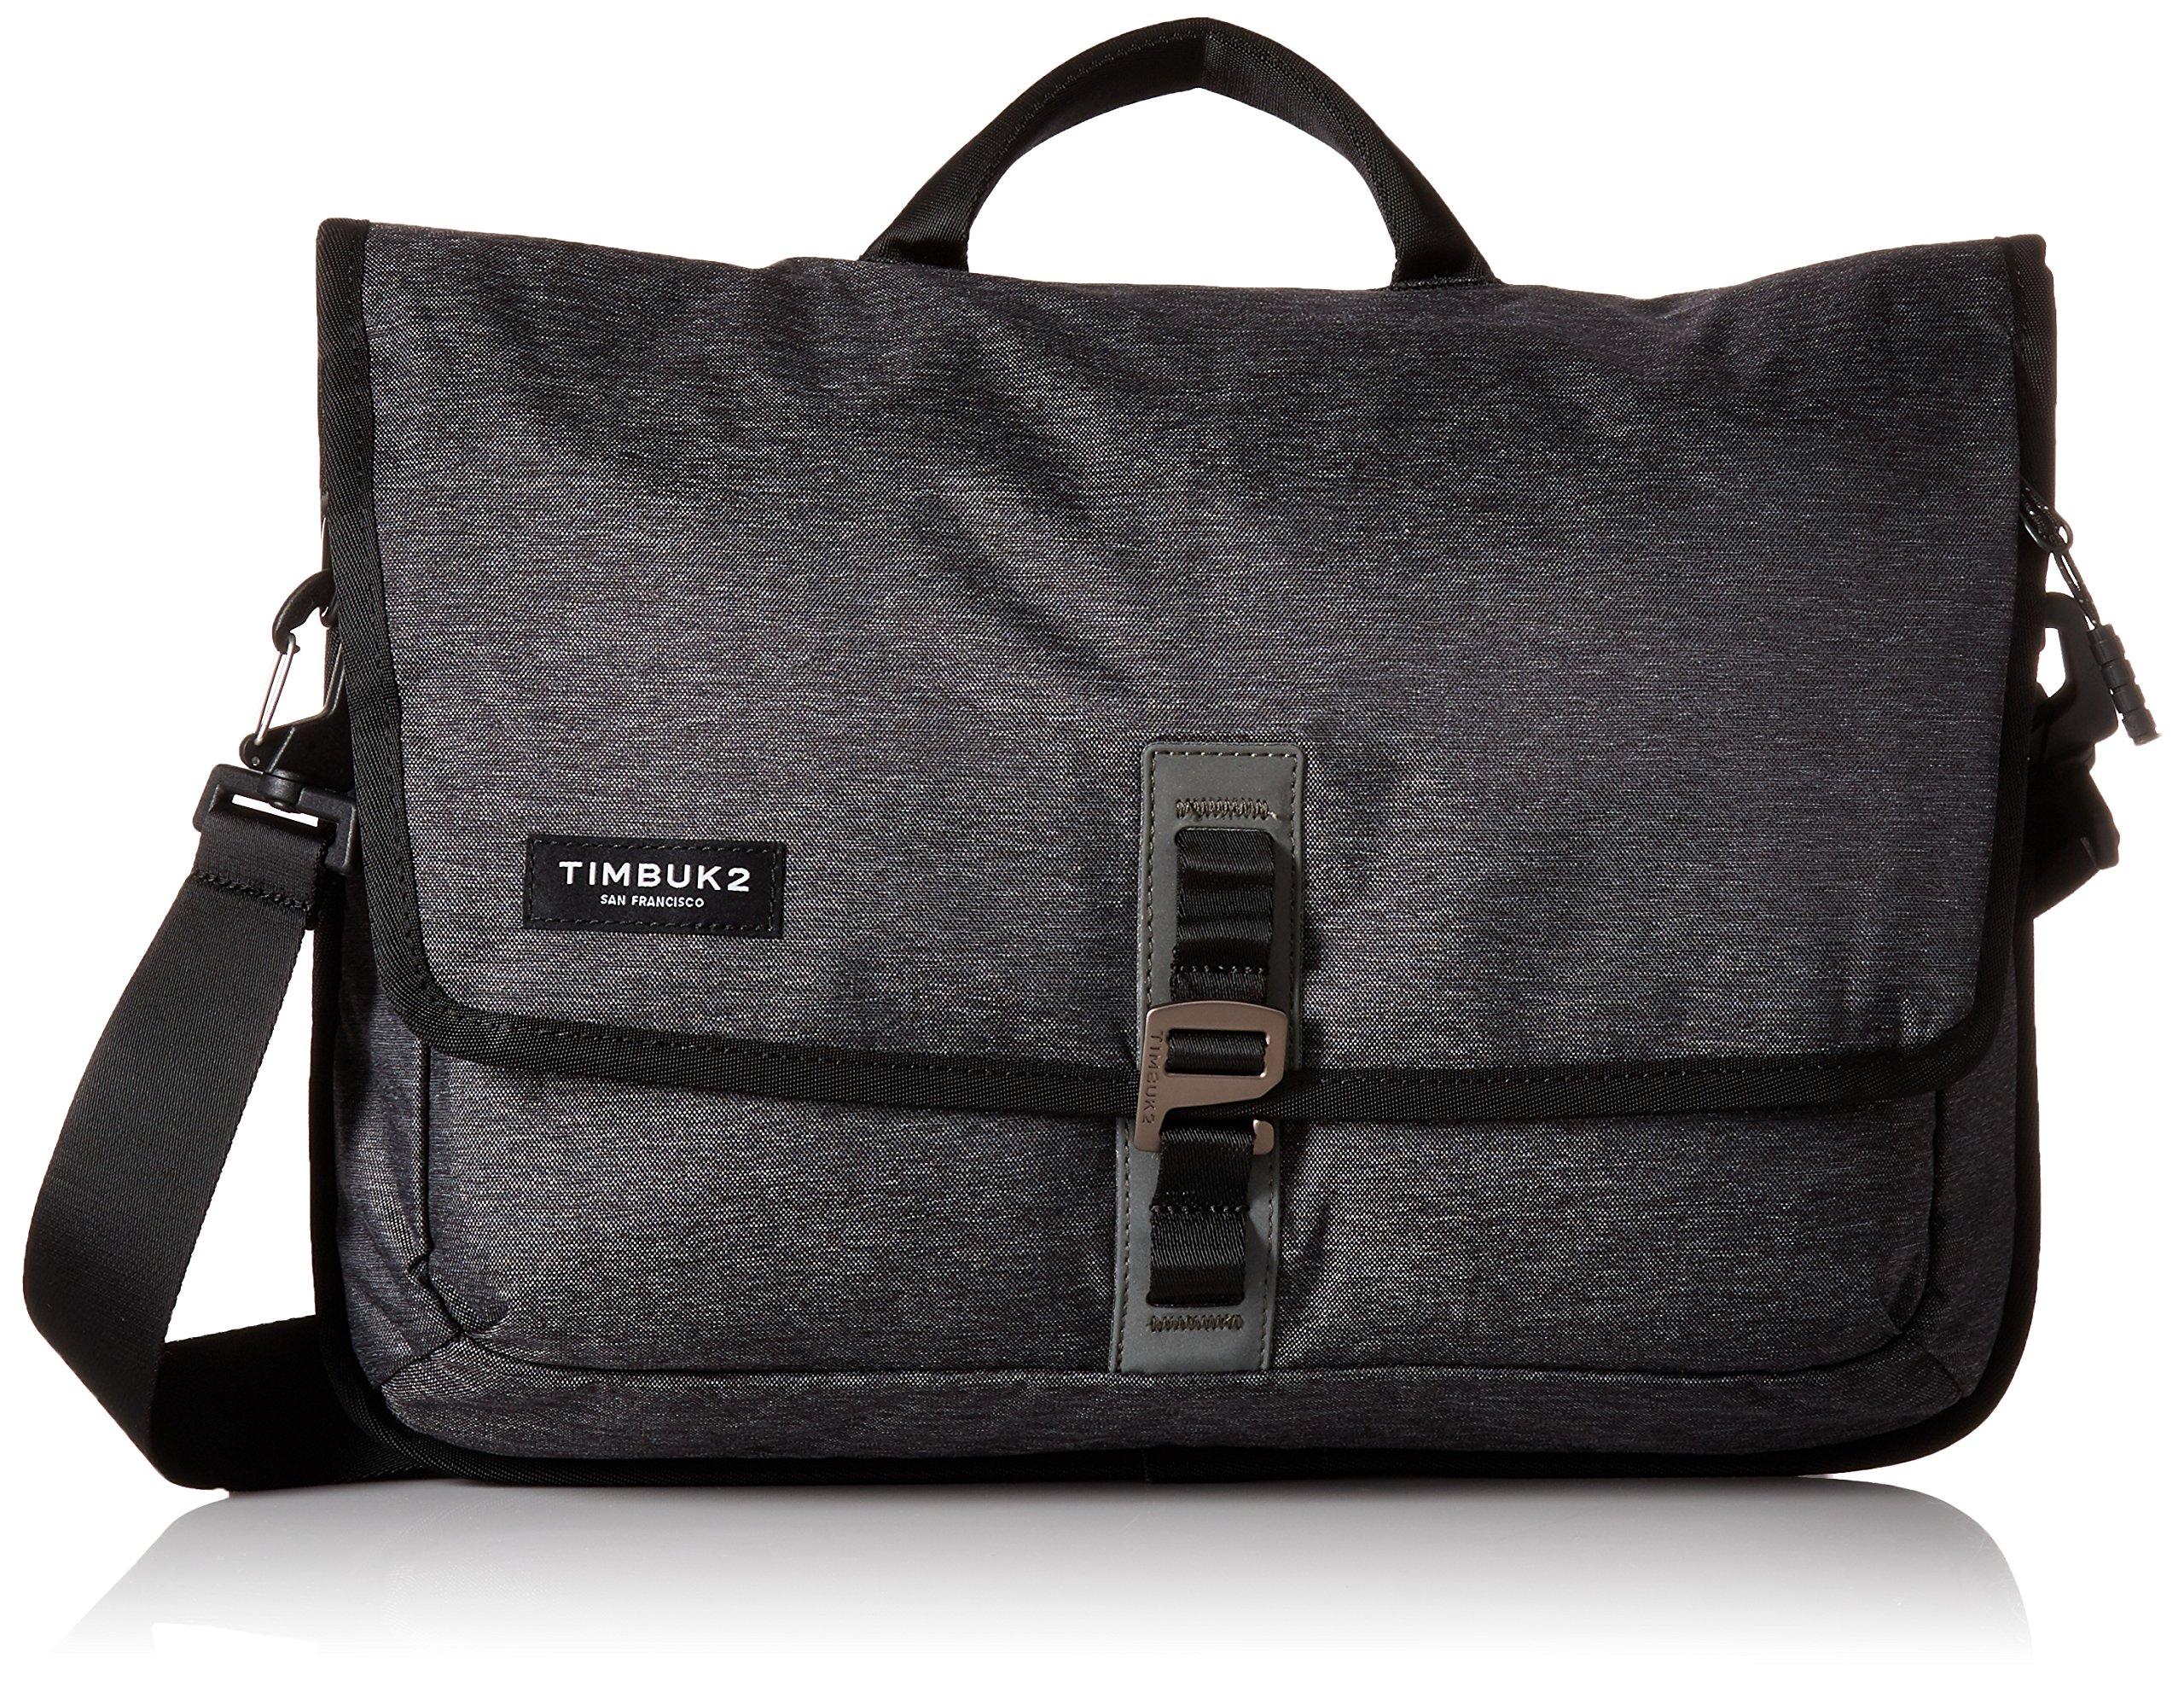 Timbuk2 Transit Briefcase, OS, Jet Black Static, One Size by Timbuk2